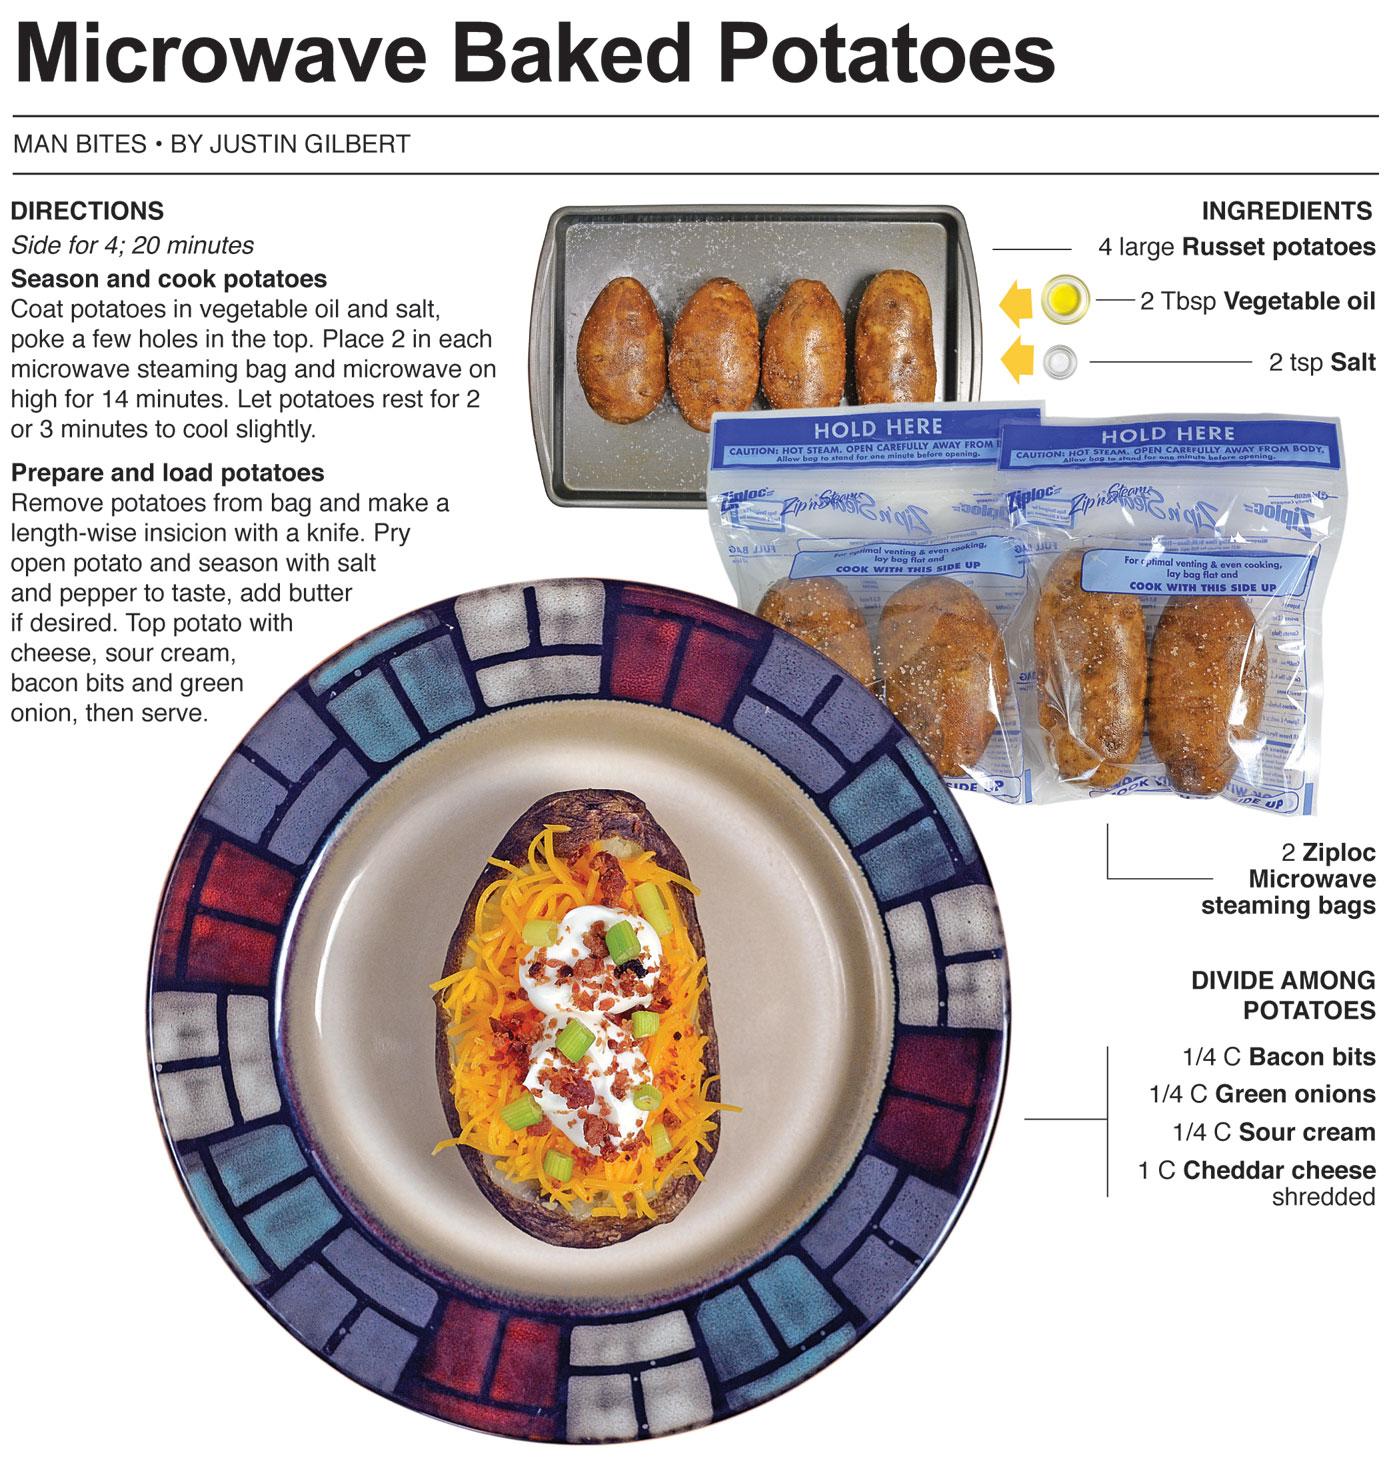 Behind The Bites: Microwave Bake Potatoes